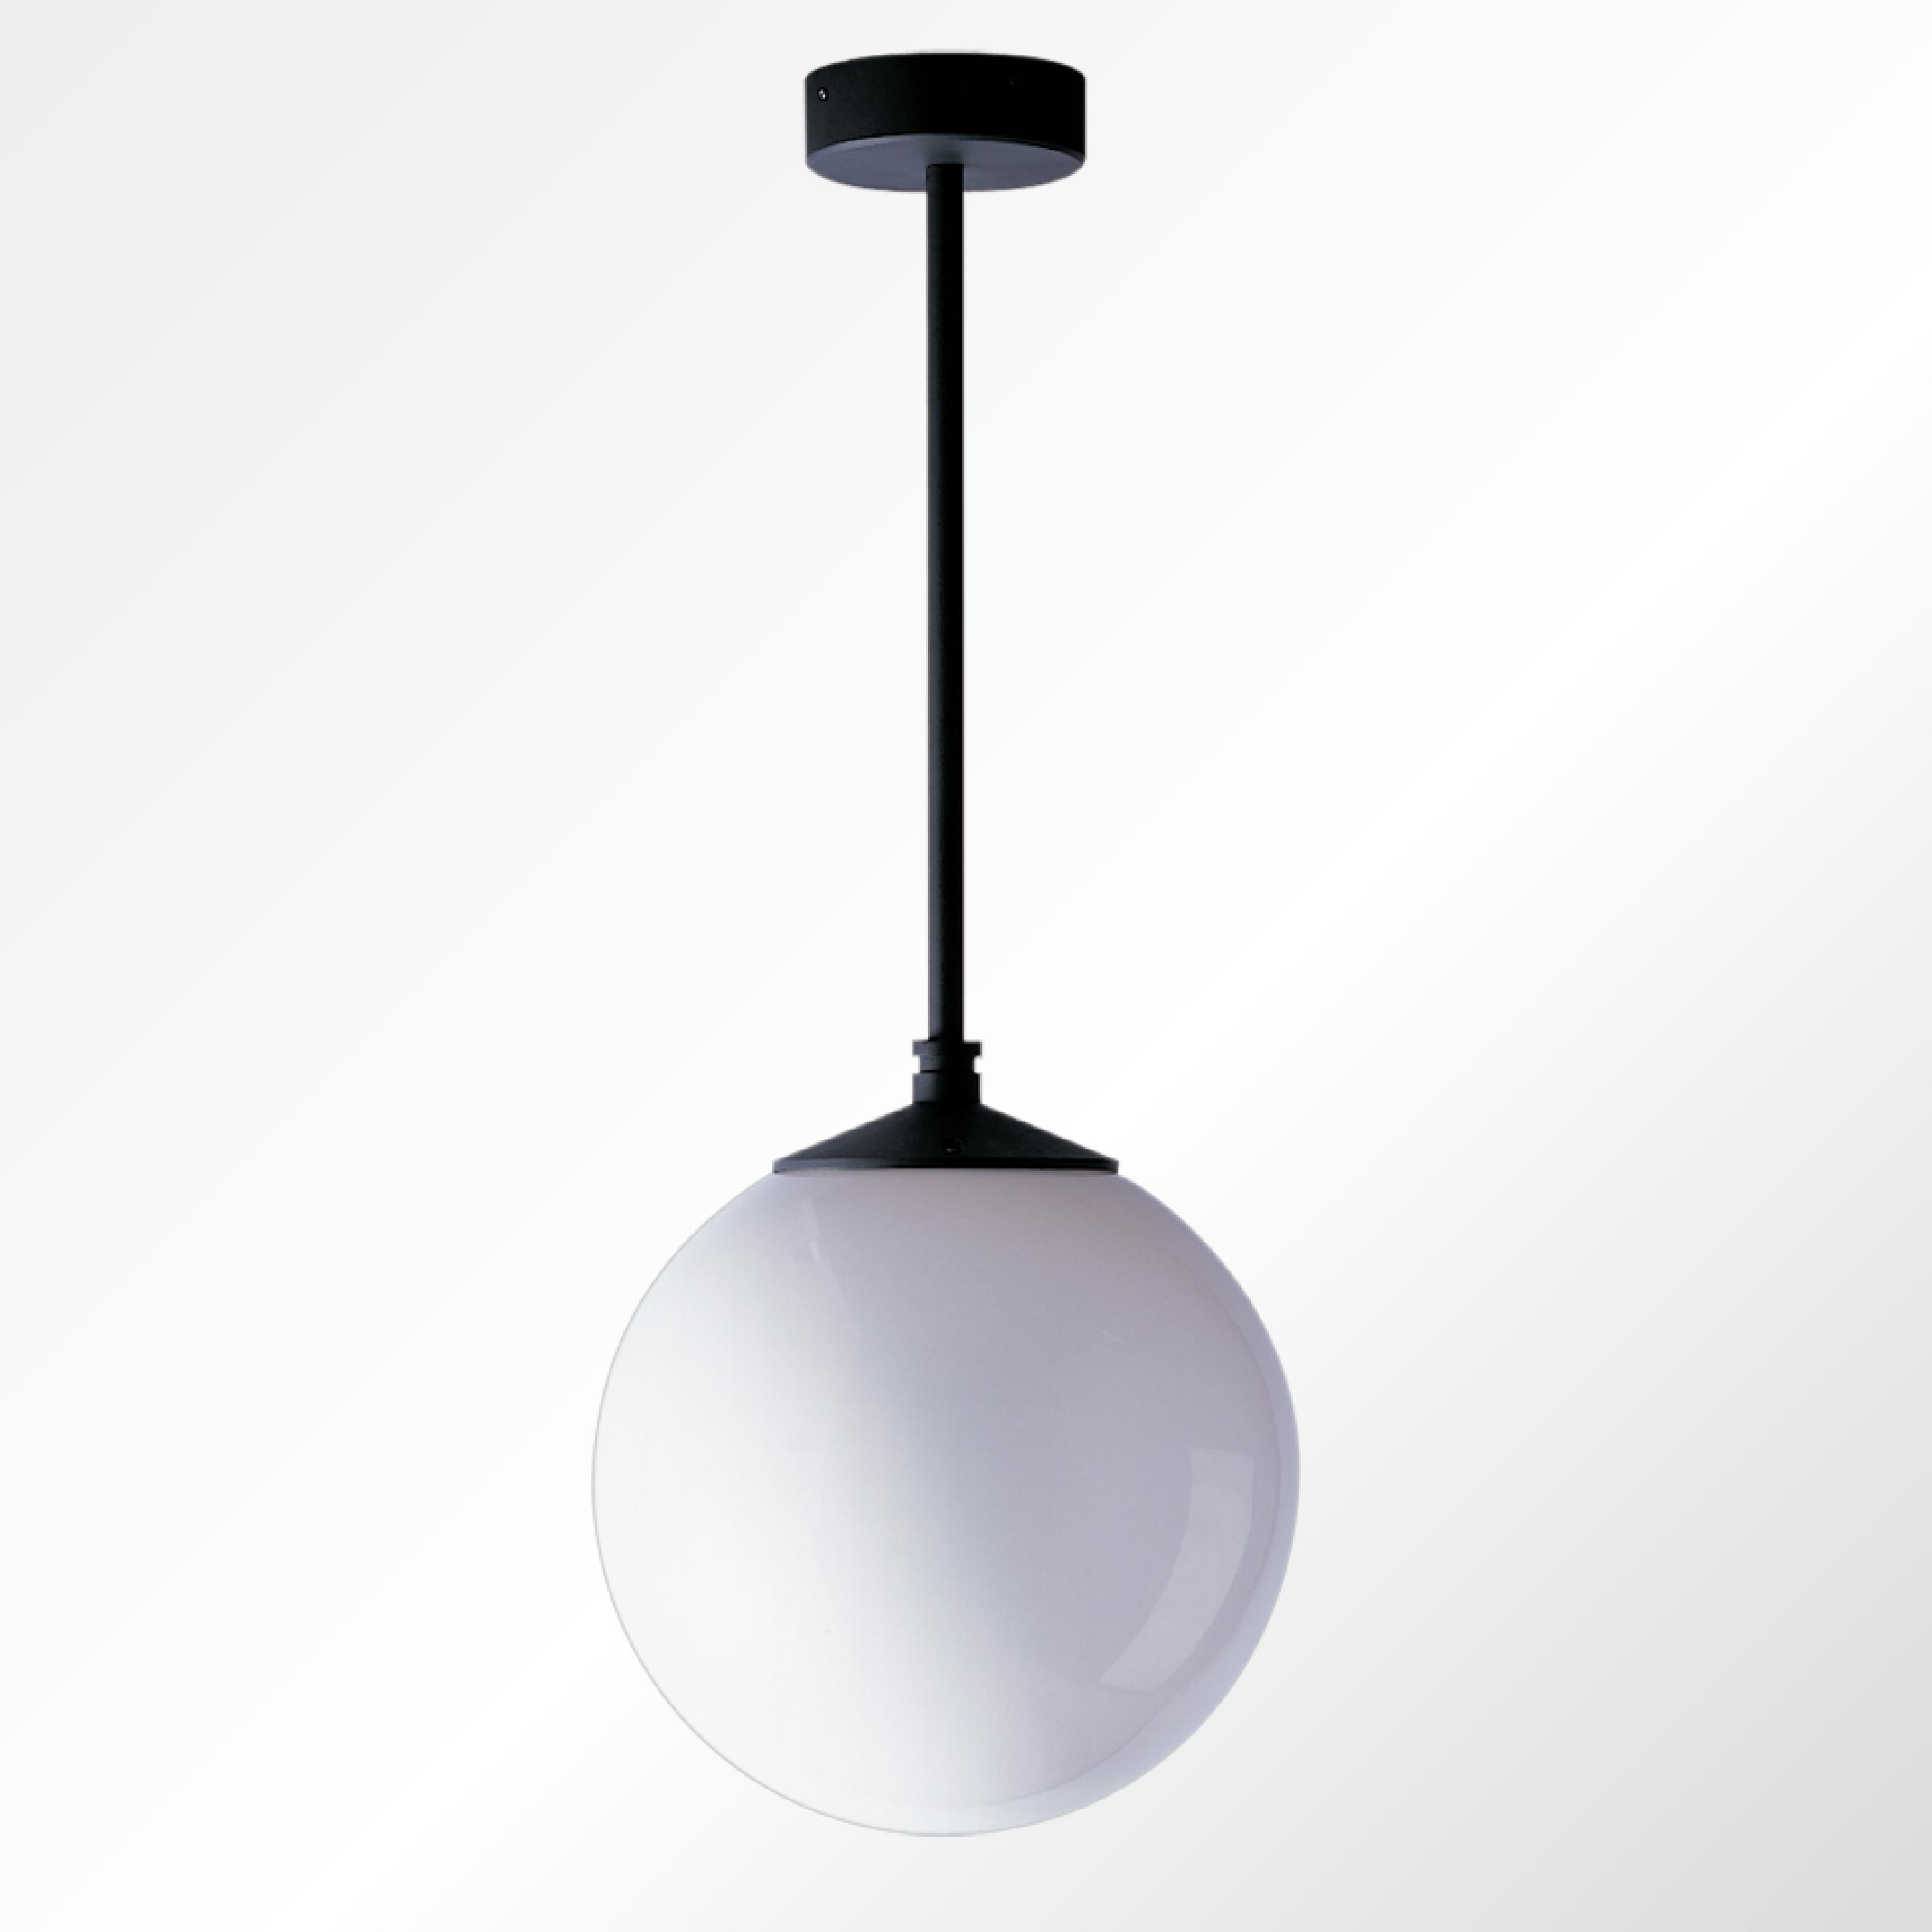 marina 1 2 pendant luminaire ligman lighting usa outdoor lighting catalog. Black Bedroom Furniture Sets. Home Design Ideas